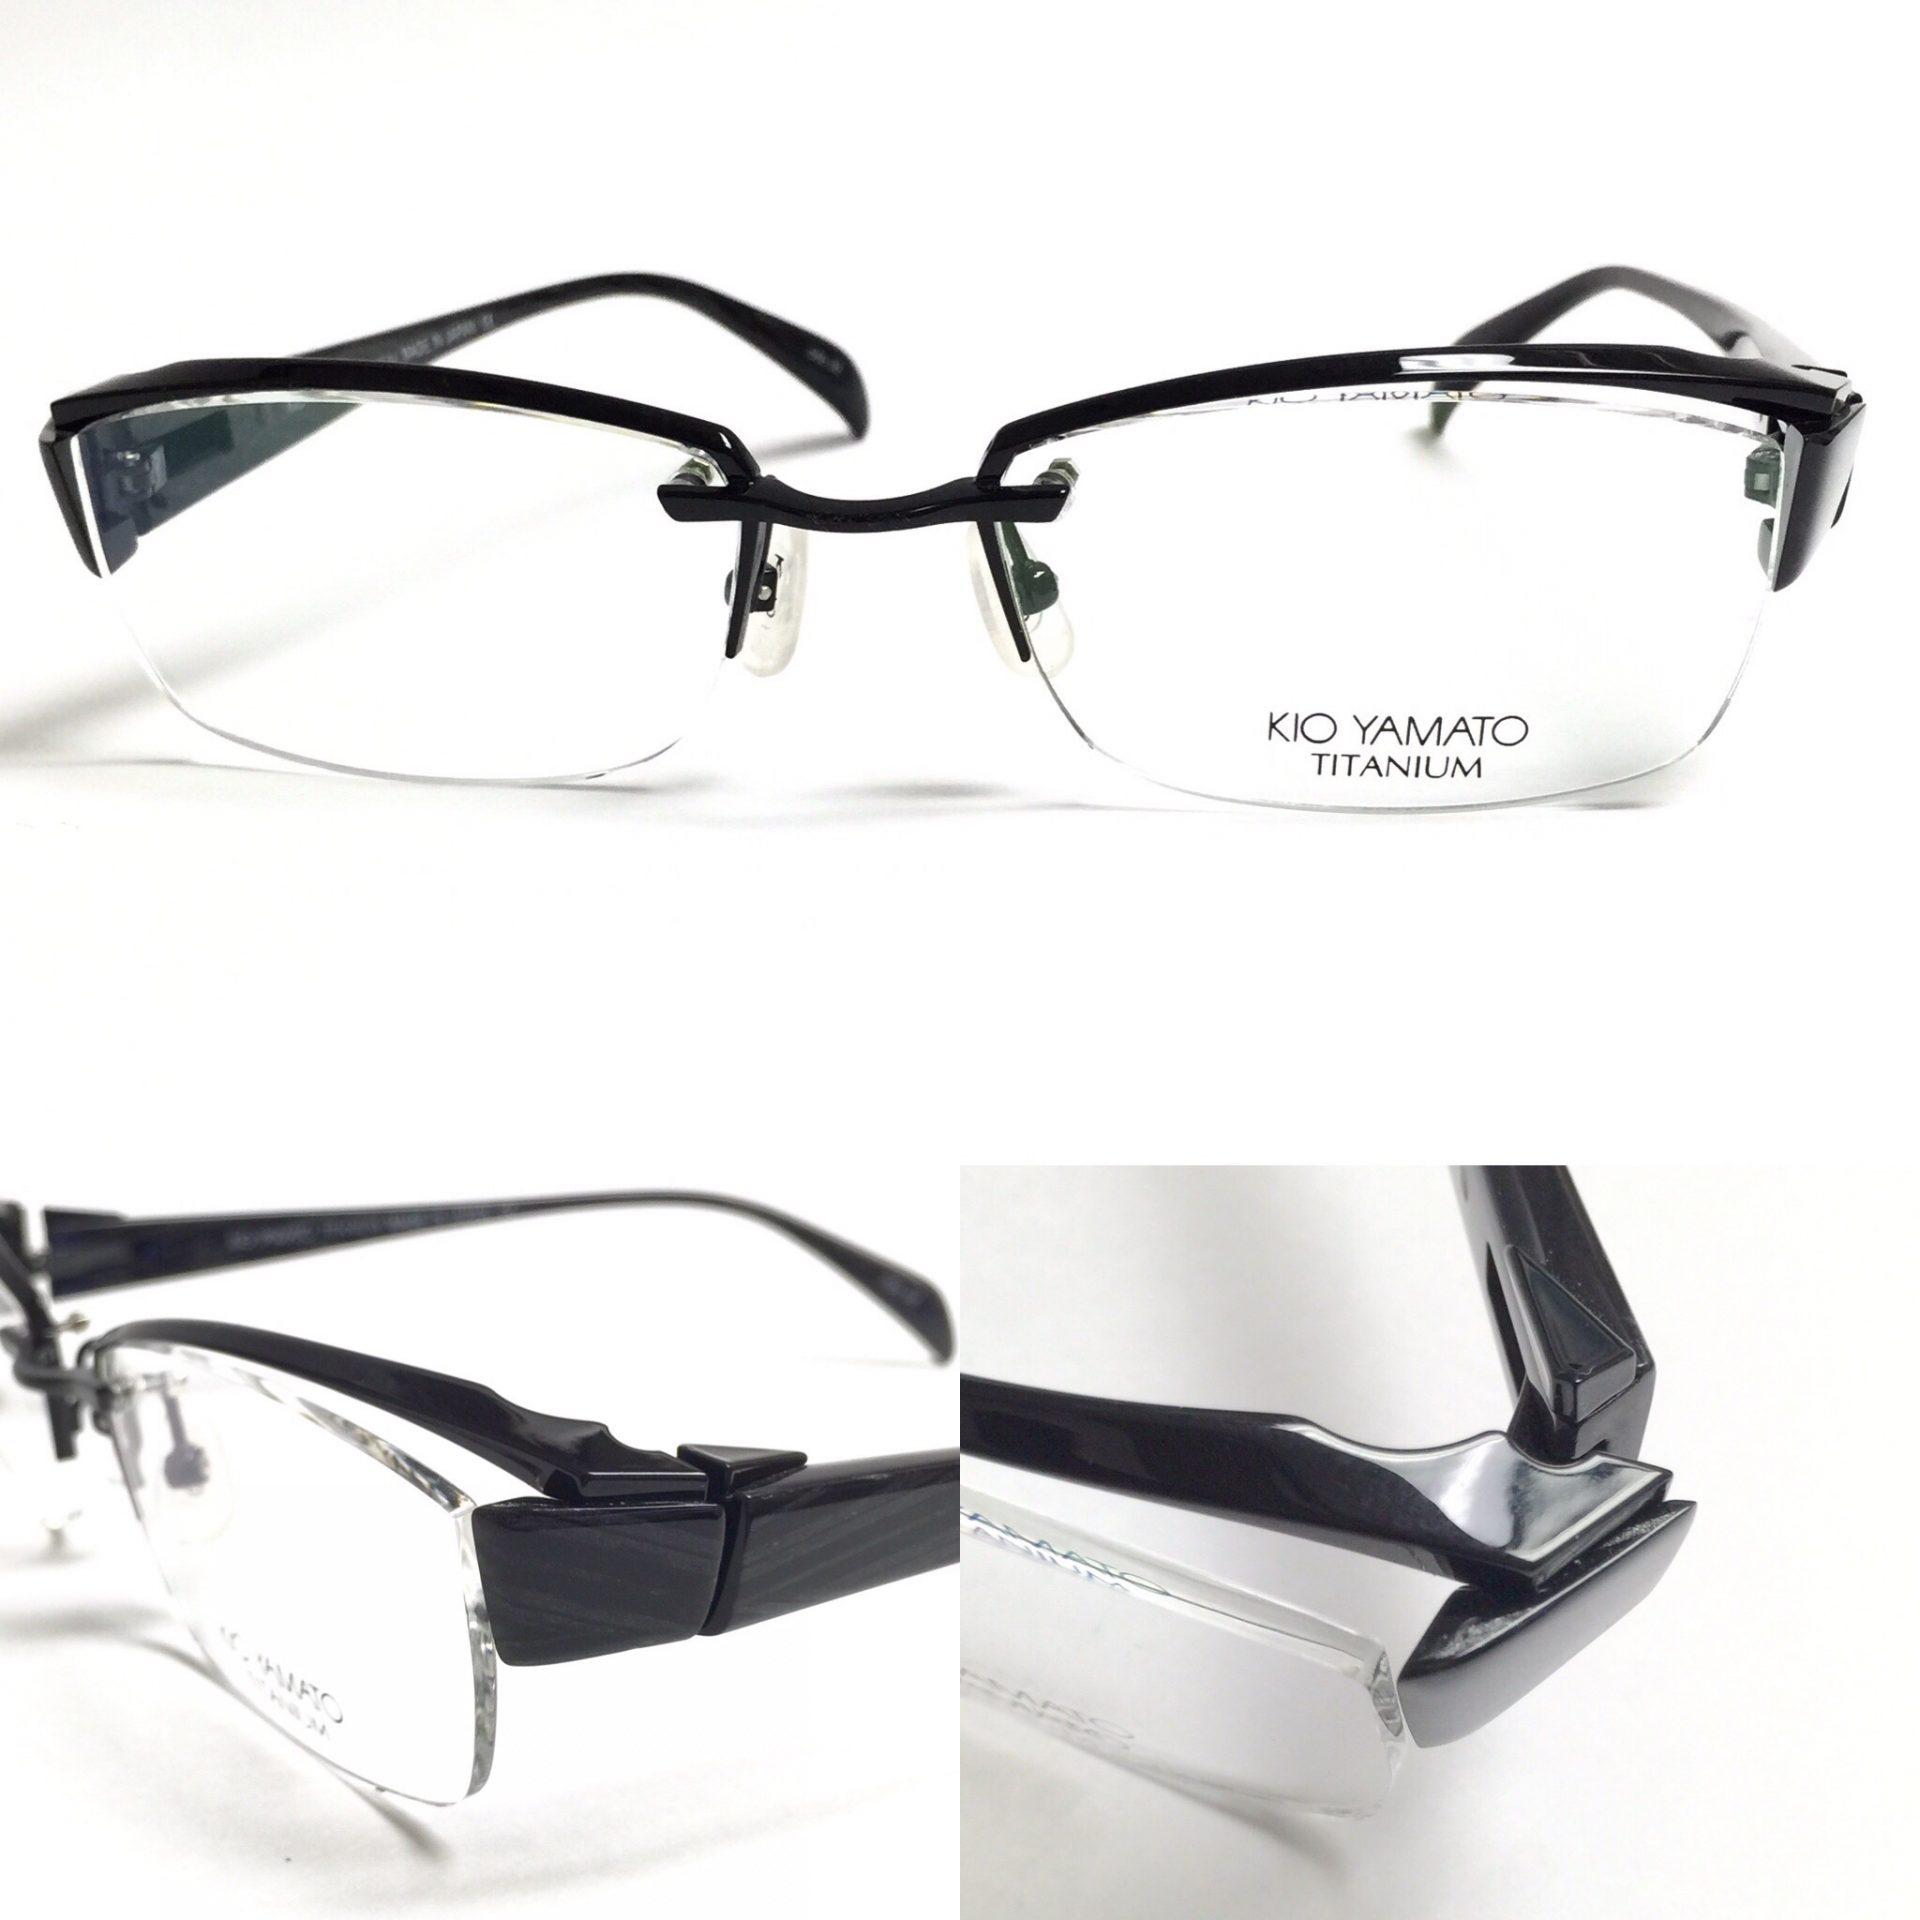 Kio Yamato Eyeglasses Frames : Kio Yamato Eyeglasses - Daniel Yamamoto, O.D. & Tracie ...